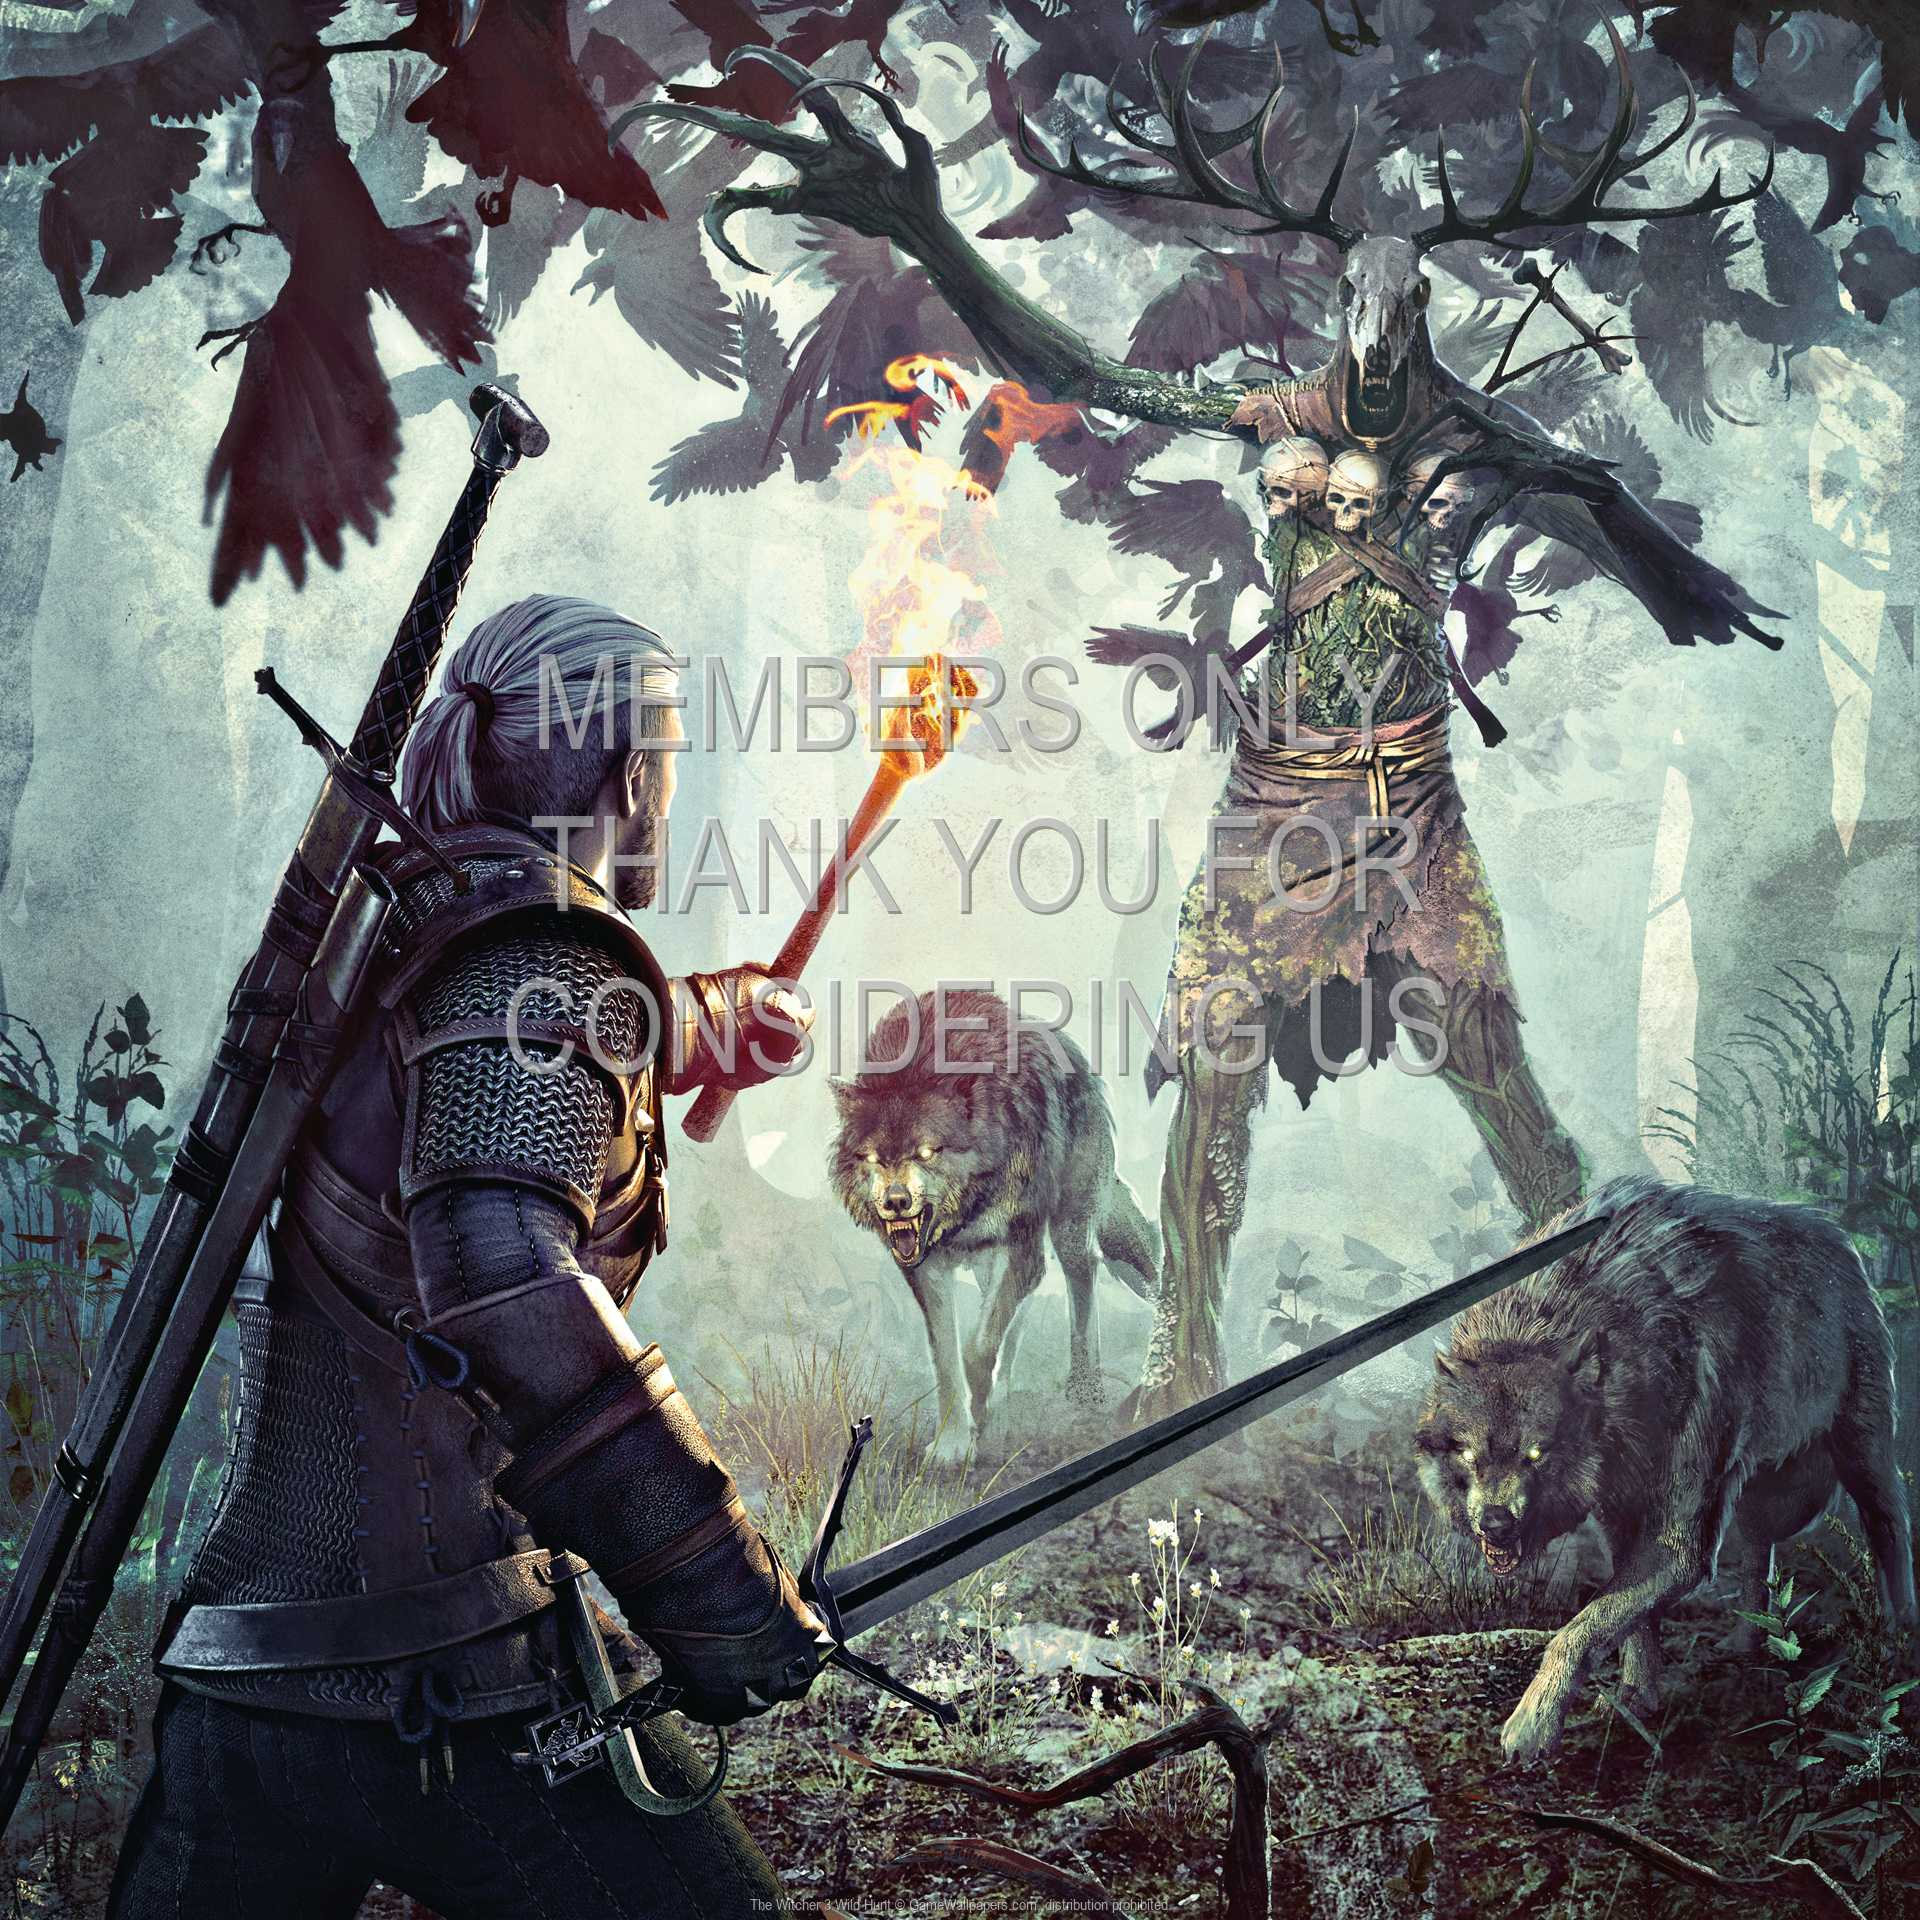 The Witcher 3: Wild Hunt 1080p Horizontal Handy Hintergrundbild 07